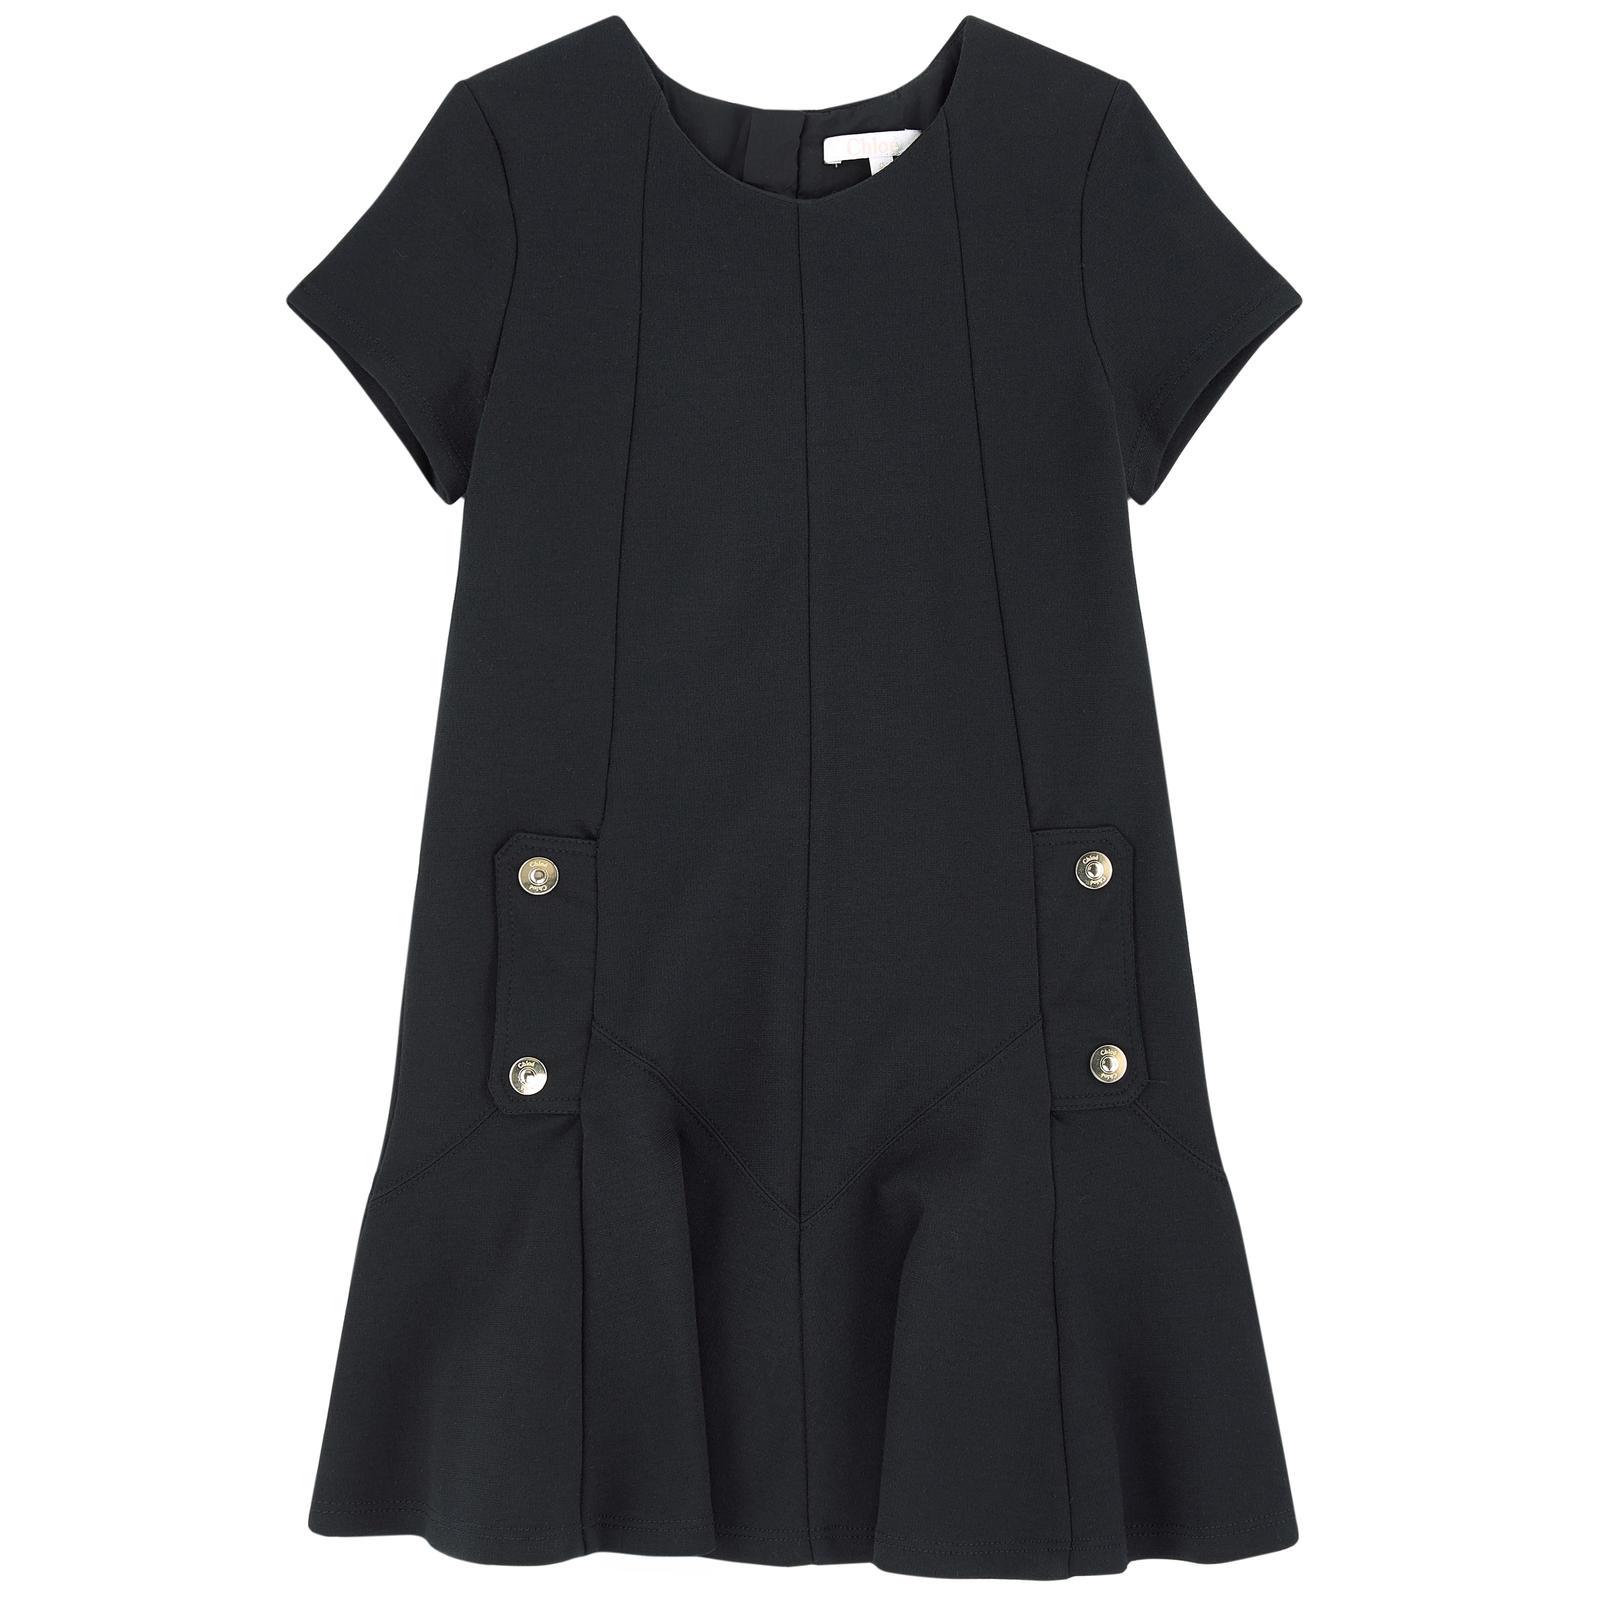 Robe Mini Me à godets Chloé en maille milano - Robe Fille Melijoe